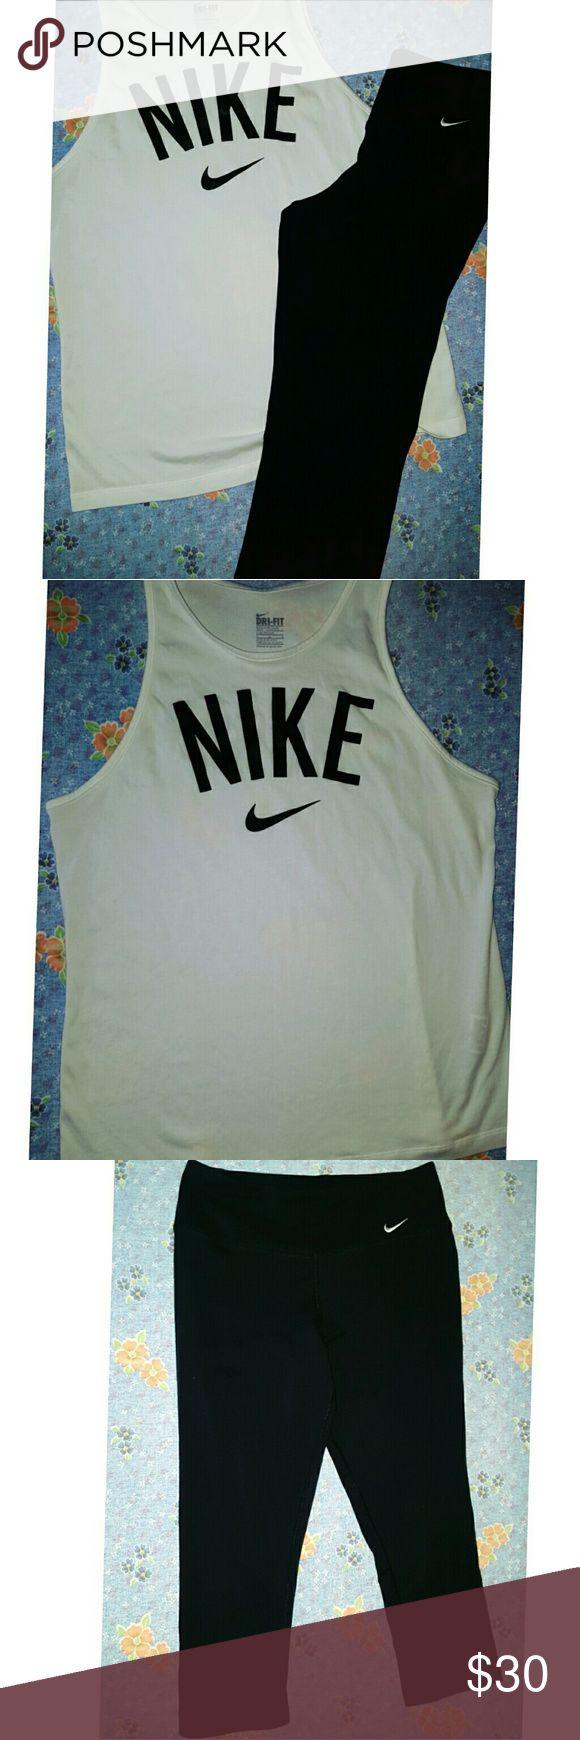 White Nike Tank and Black Nike Yoga Pants White Nike Tank and Black Nike Yoga Pants Nike Tops